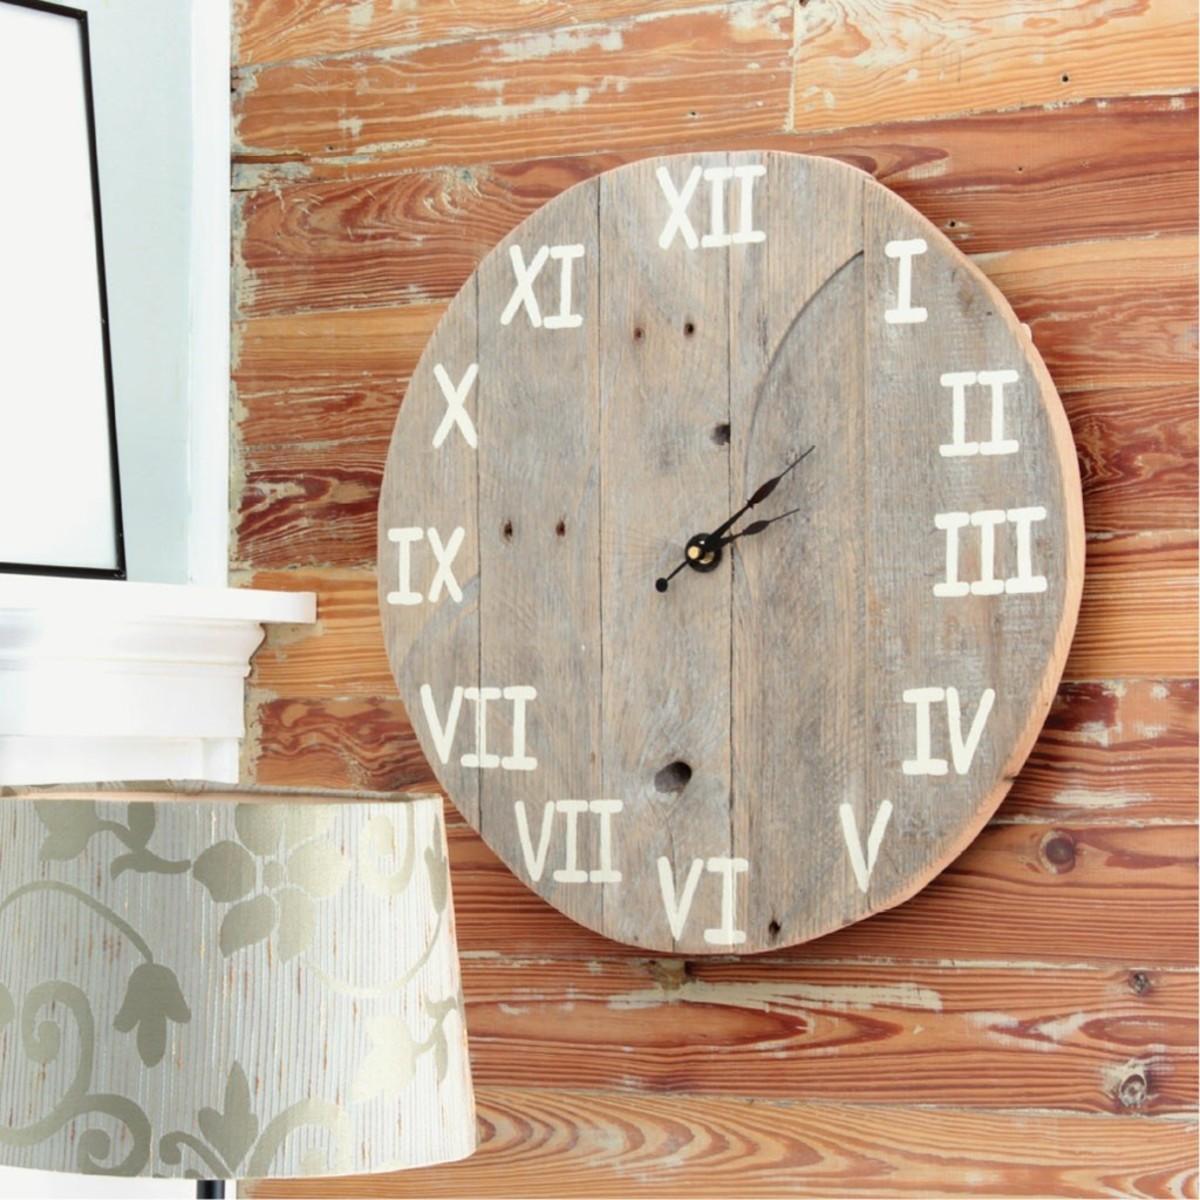 Guerilla Furniture Design - Rustic Wooden Clock (DIY Projects)